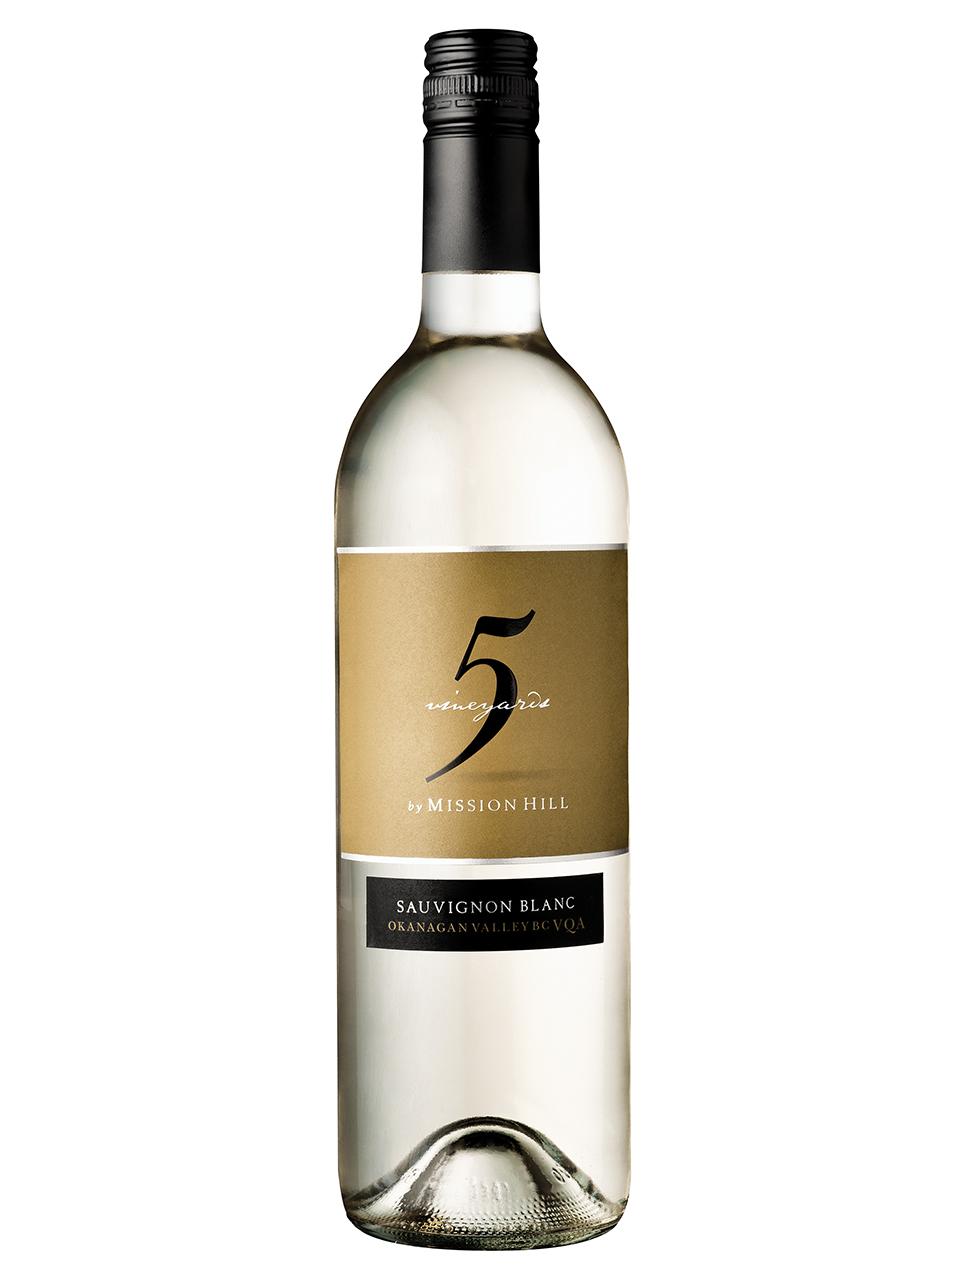 Mission Hill Five Vineyards Sauvignon Blanc VQA